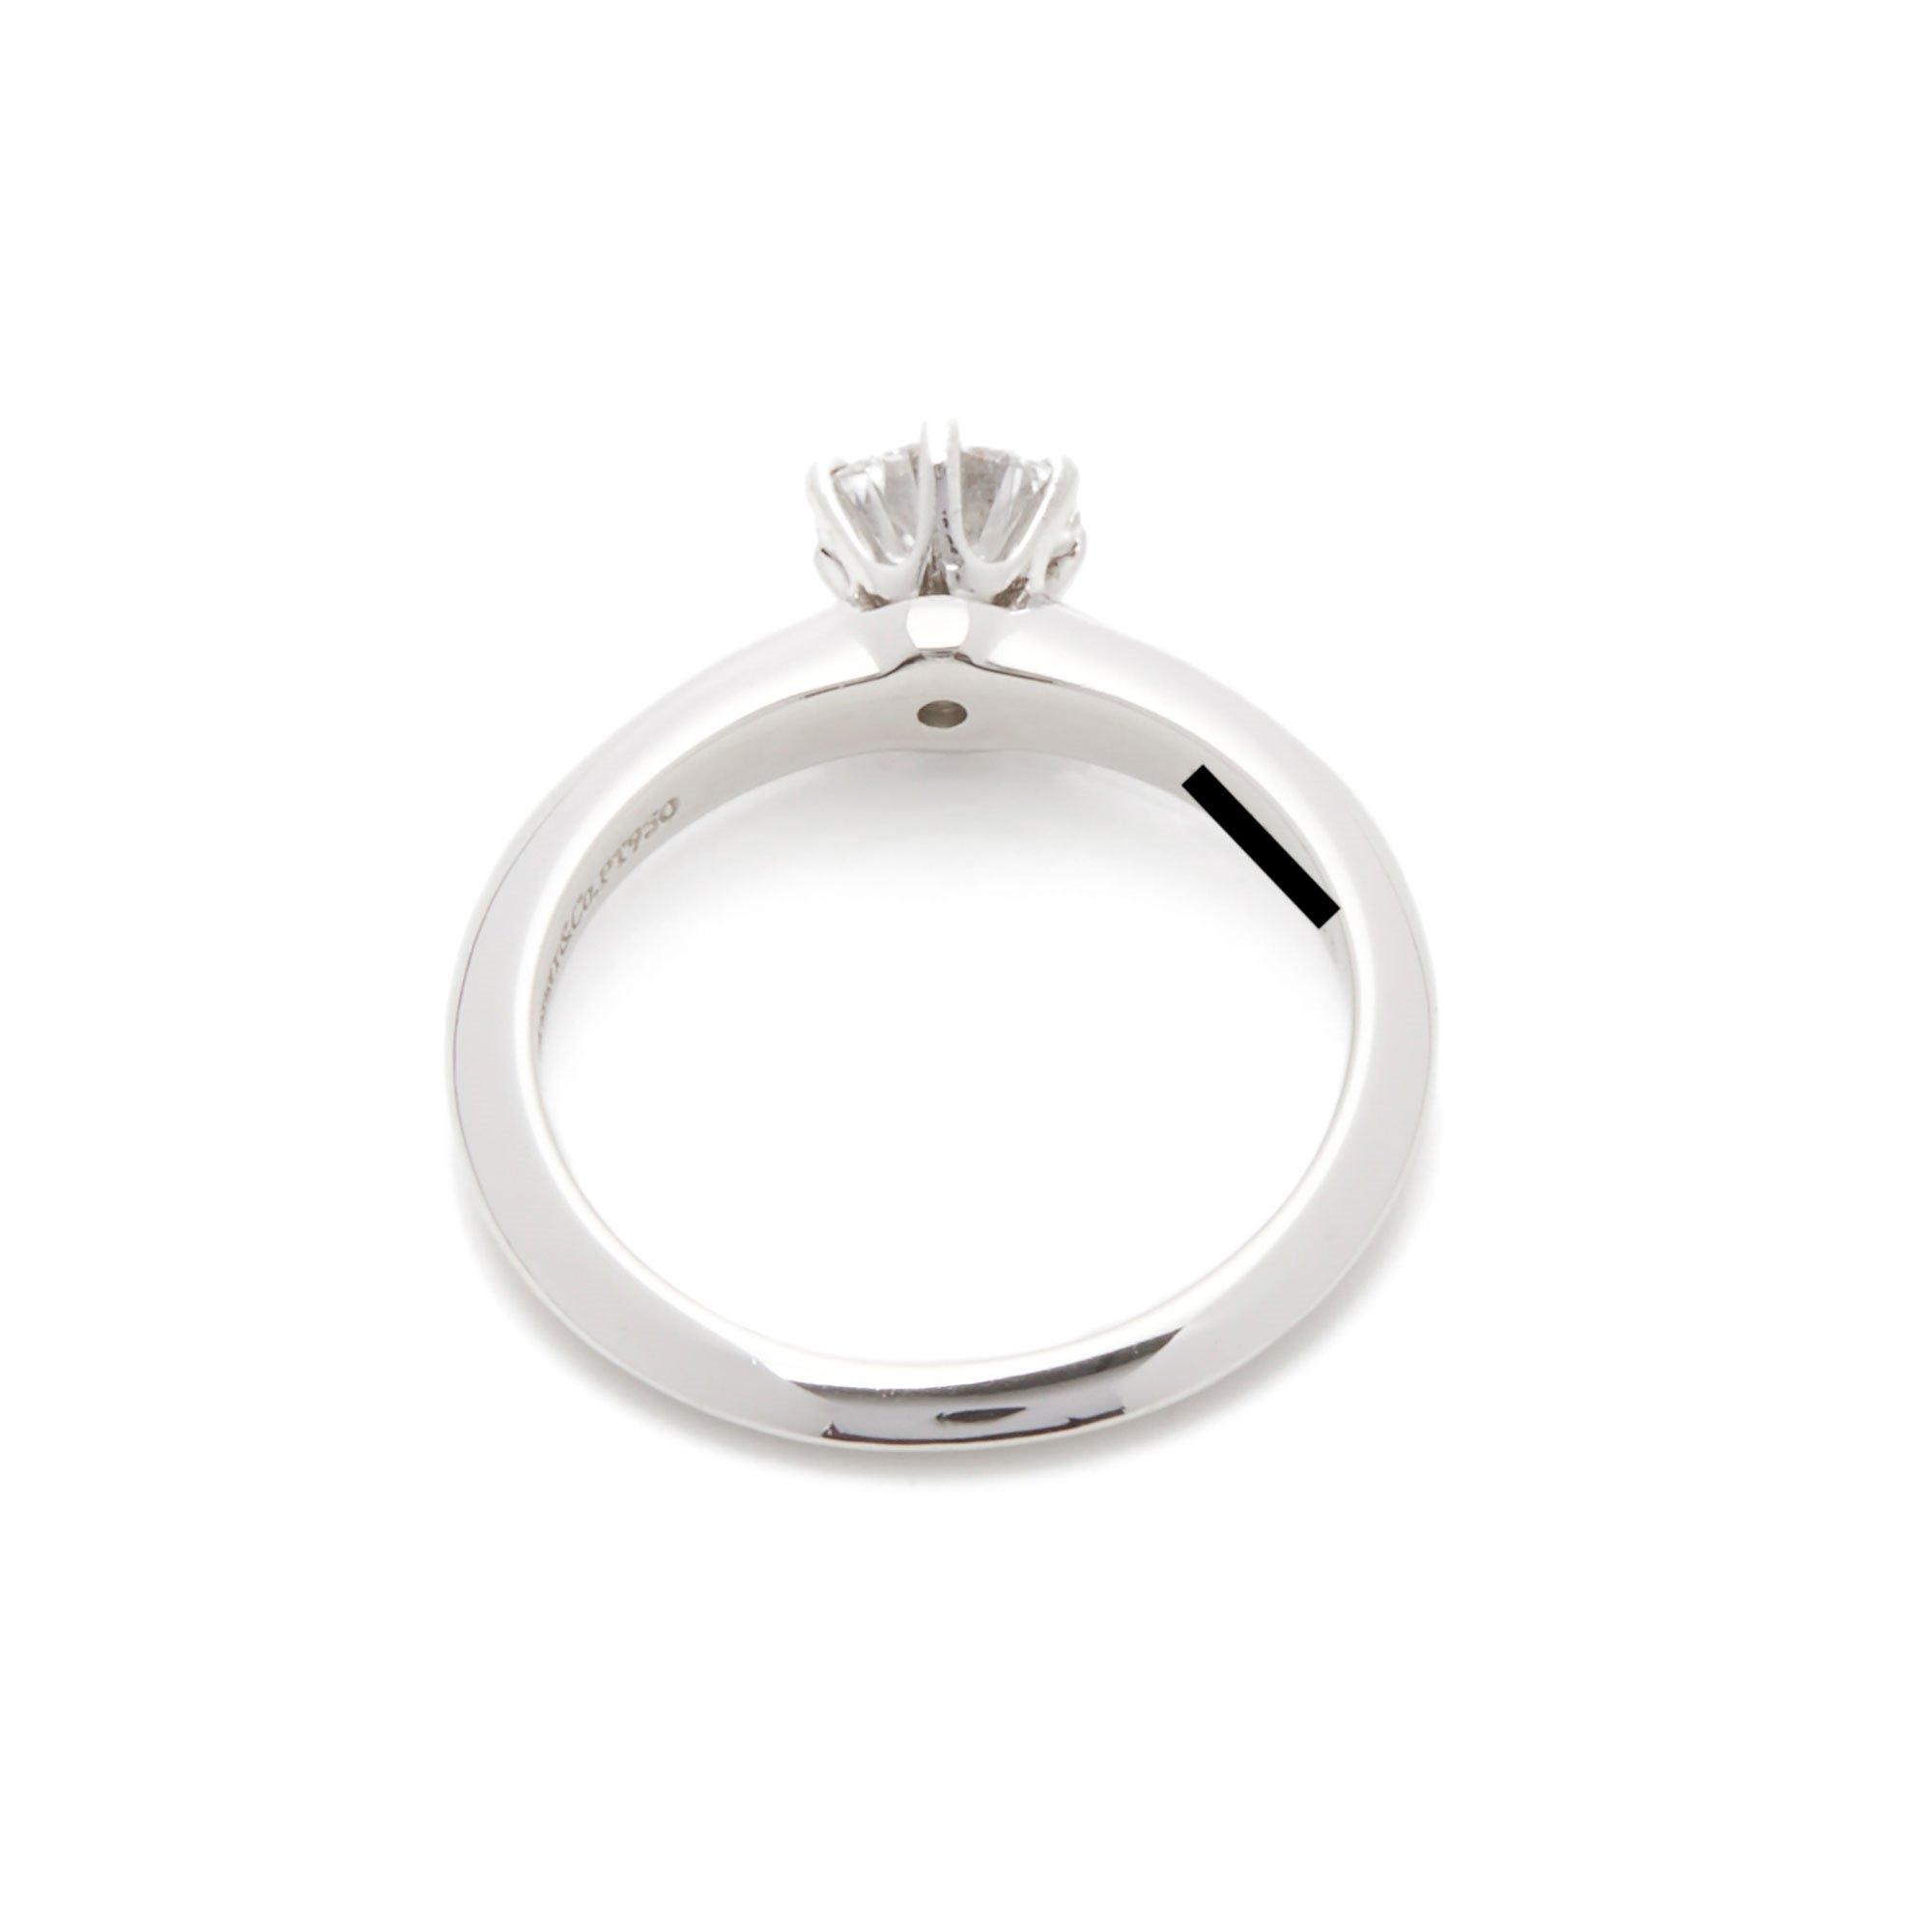 Tiffany & Co. Platinum 0.57ct Diamond Solitaire Engagement Ring